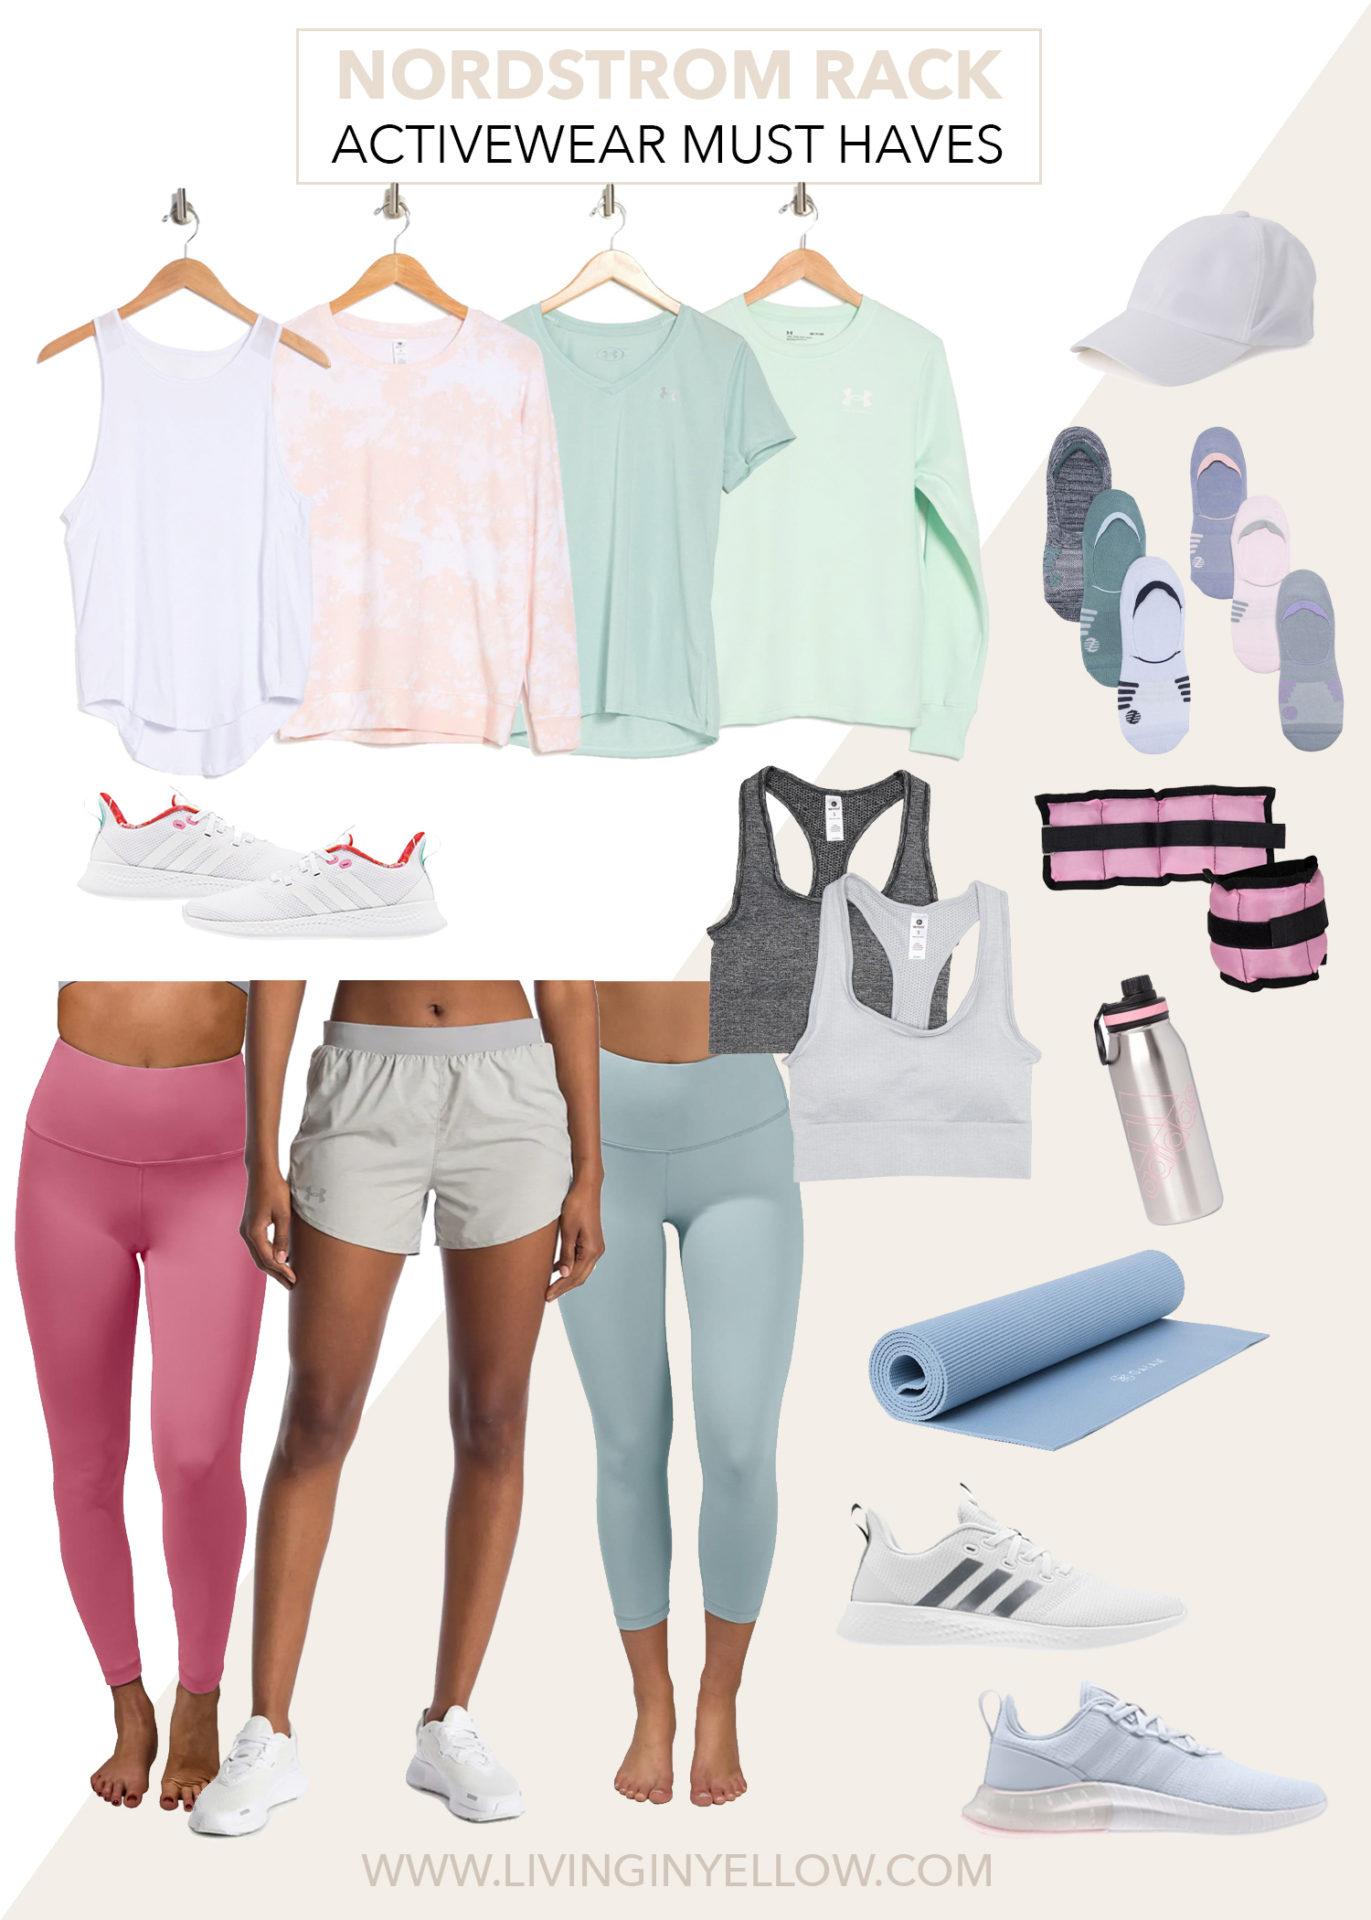 activewear favorites from nordstrom